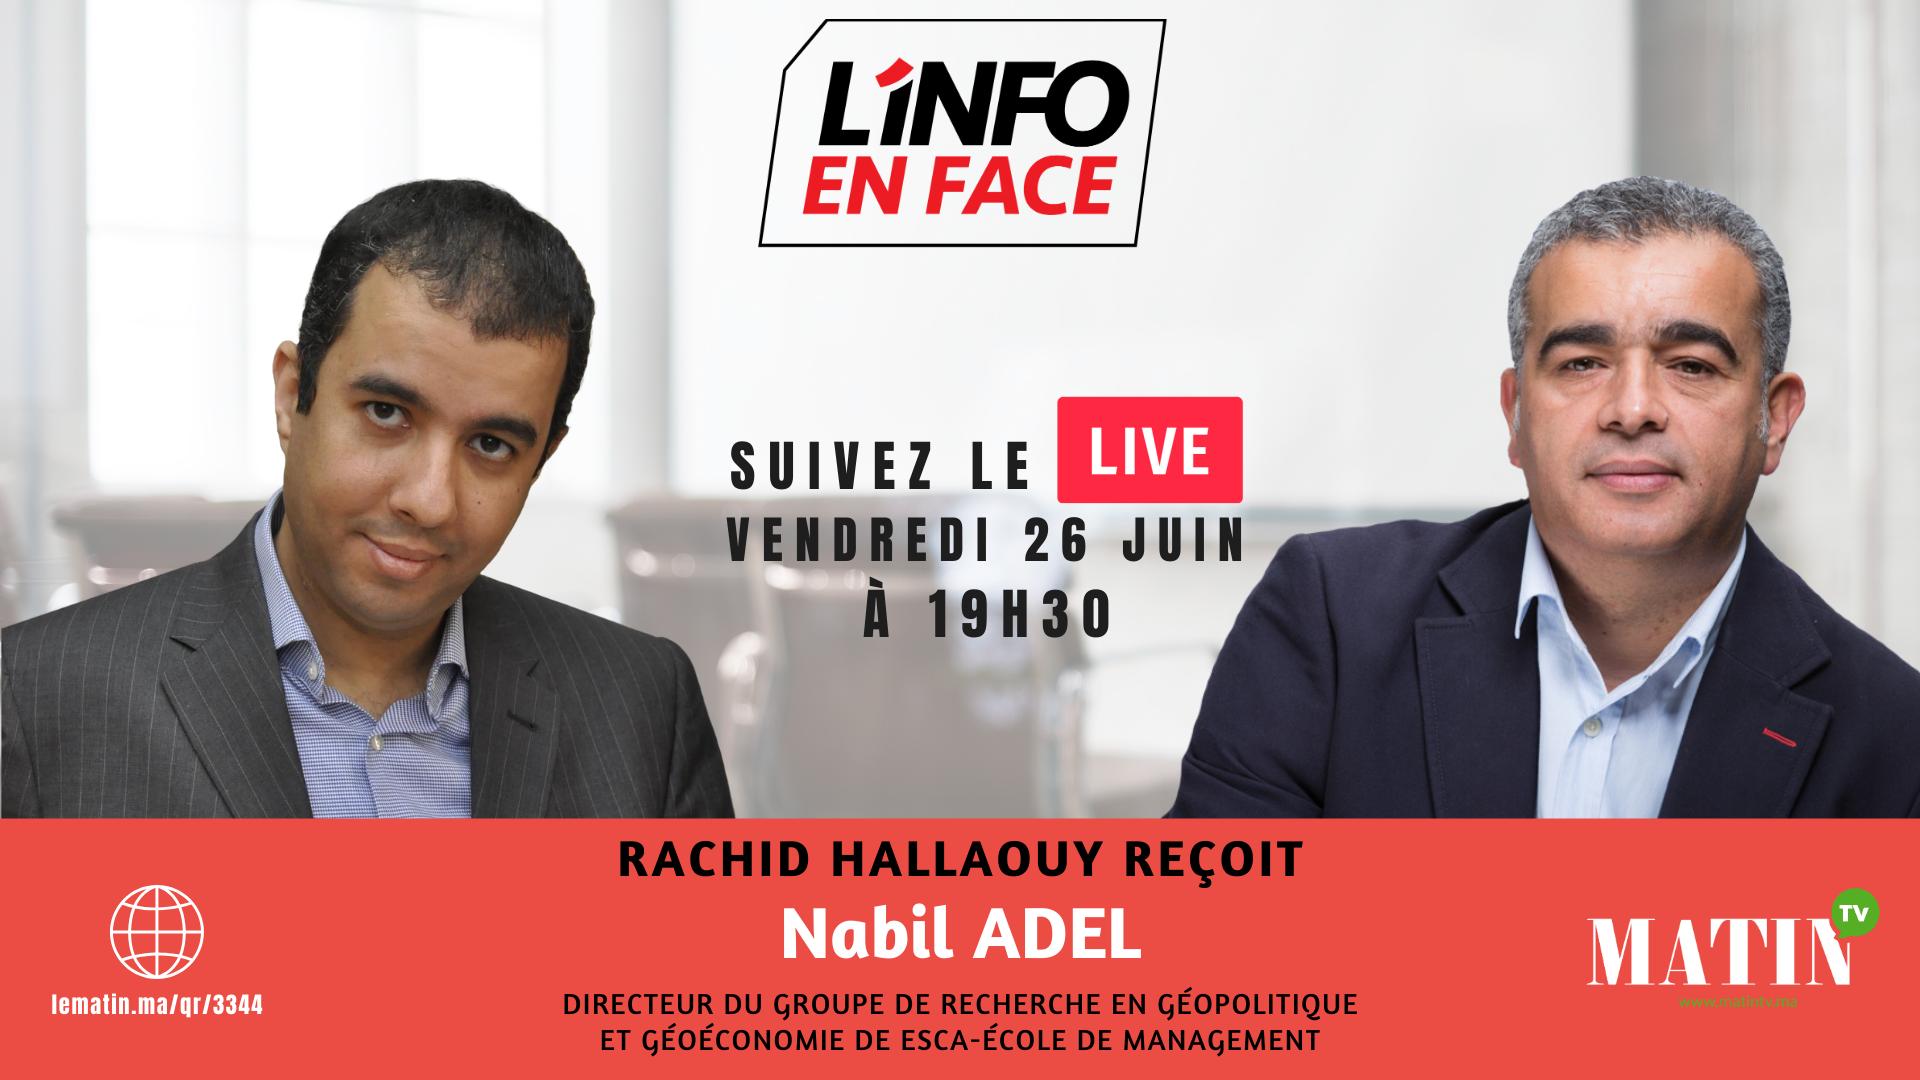 Live : L'Info en Face avec Nabil Adel